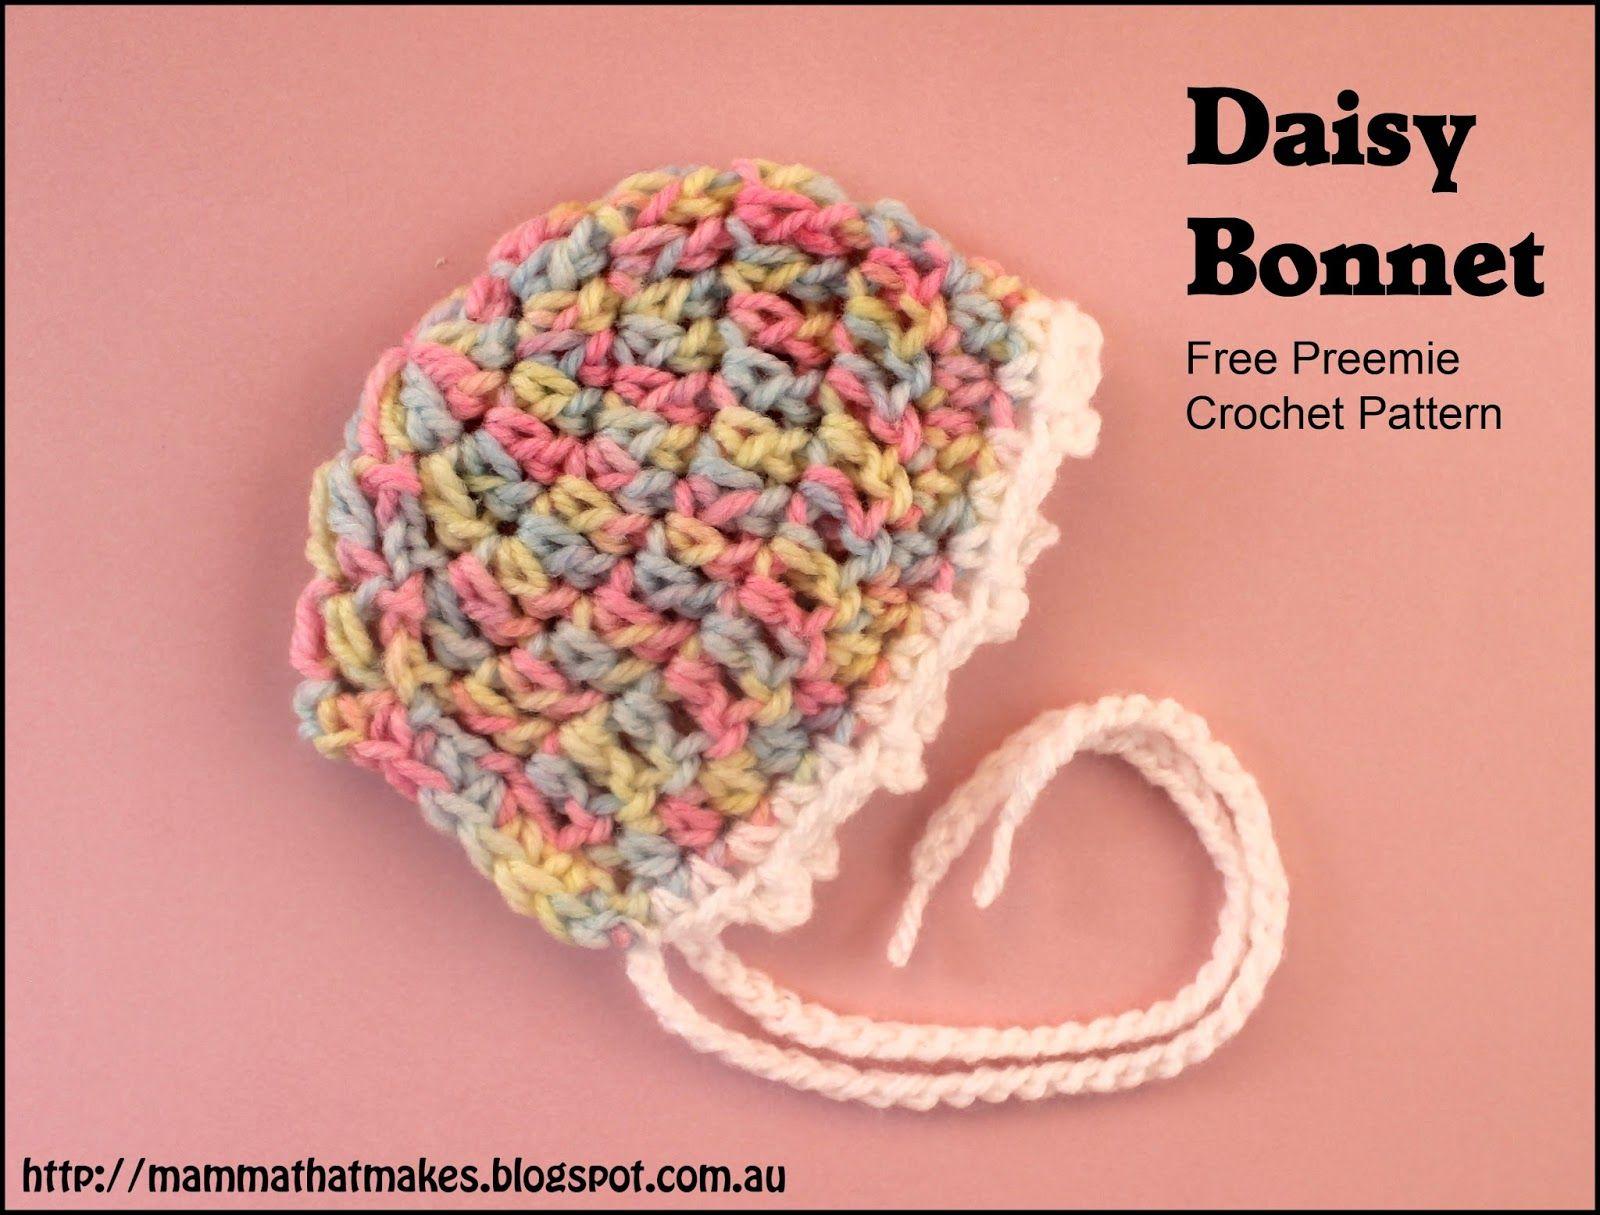 The Daisy Bonnet by Mamma That Makes. A free preemie crochet pattern ...